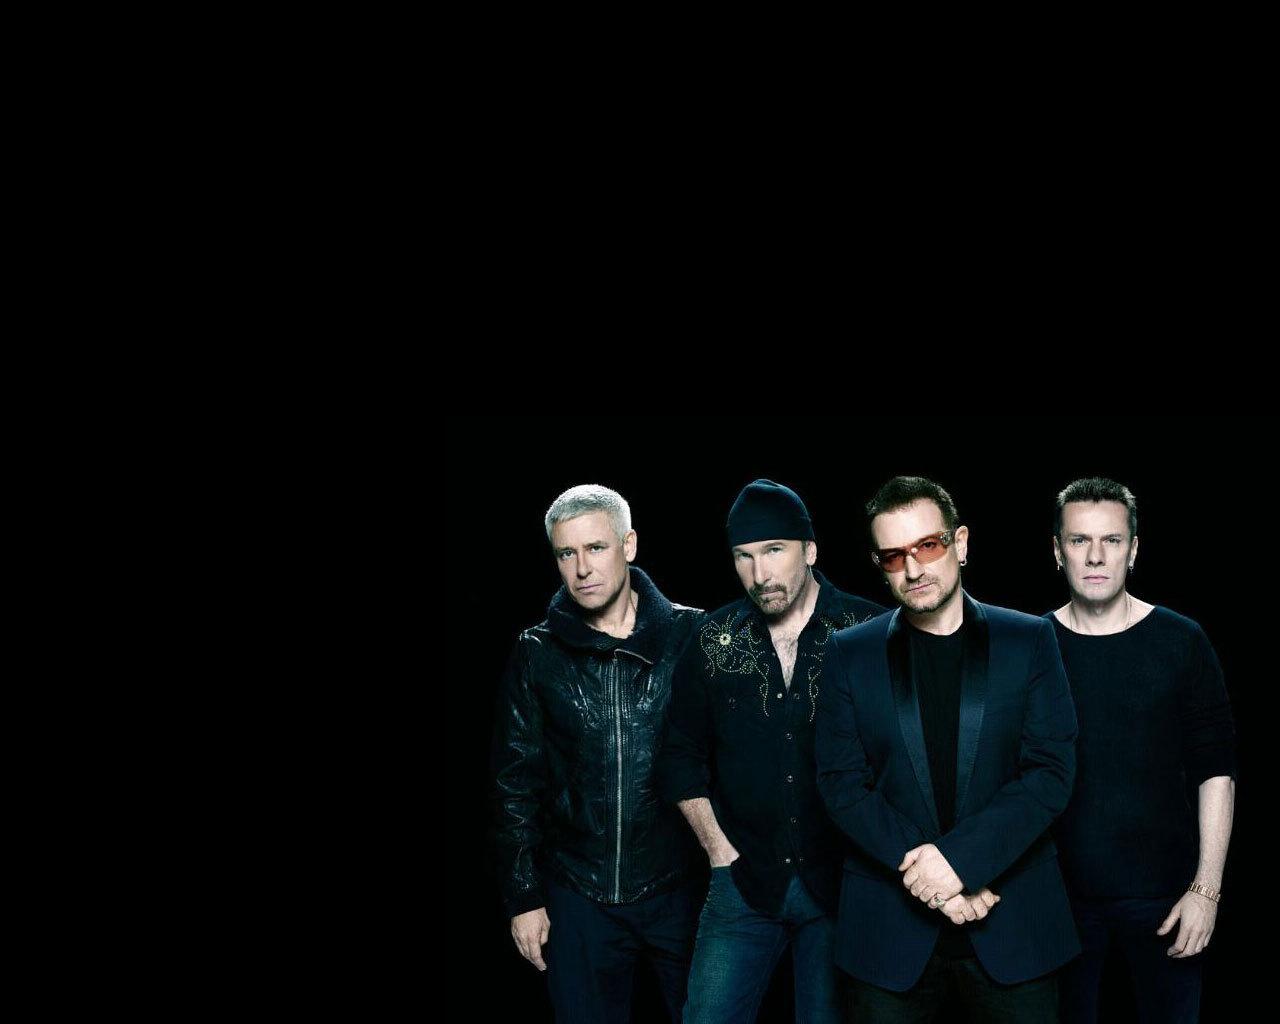 U2 Wallpapers - ...U2 Wallpaper